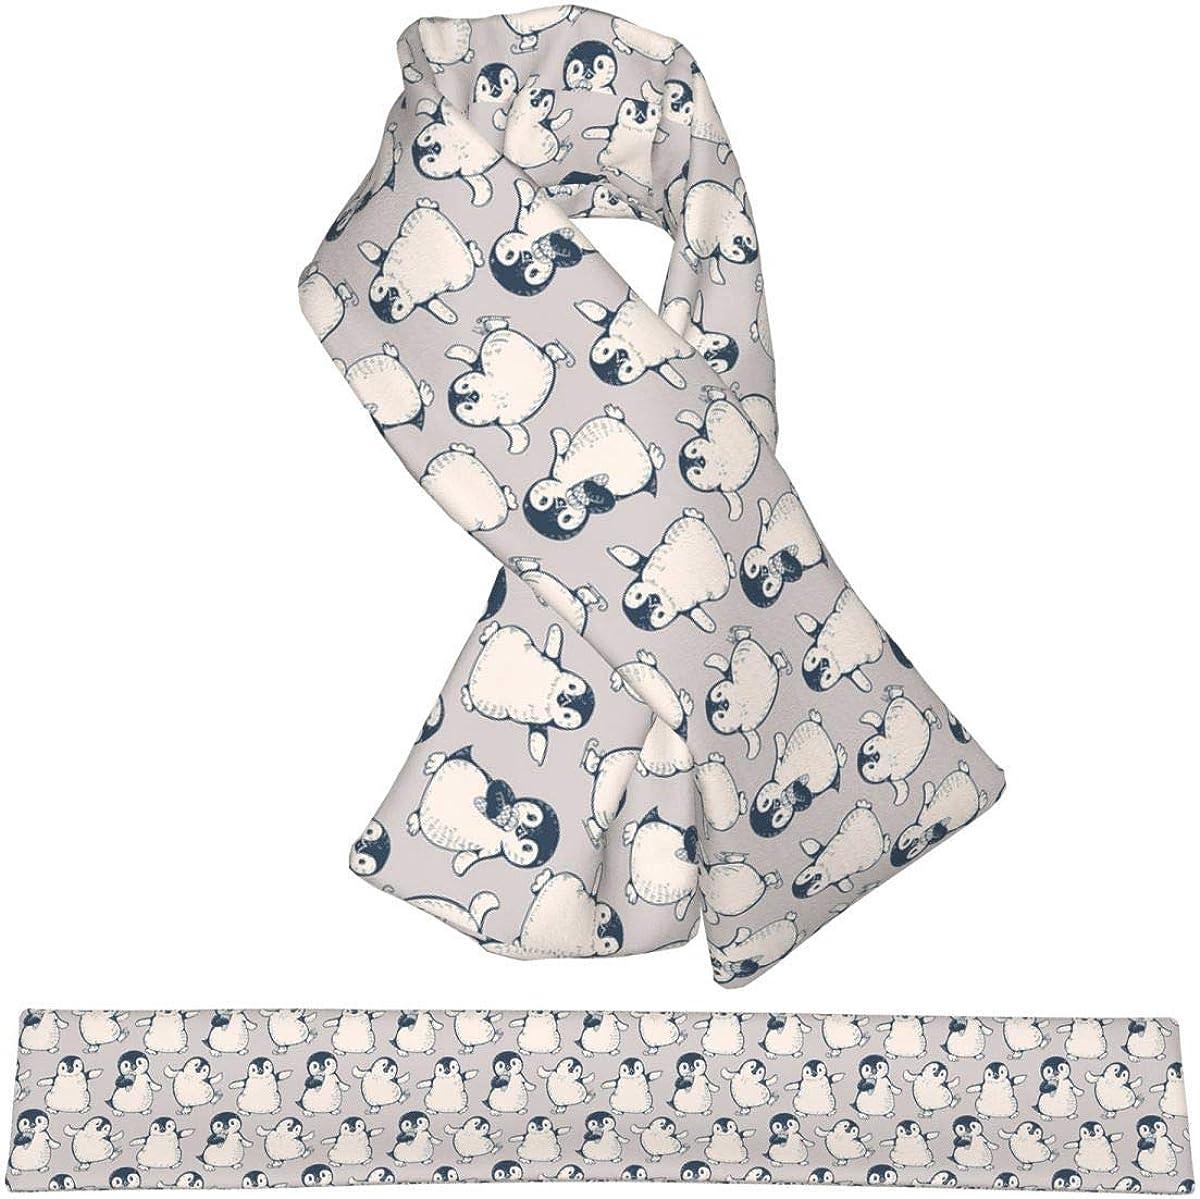 Cute Worm Flannel SALENEW very popular Scarf Warm Neck Scarves Windproof For An Women 2021 new